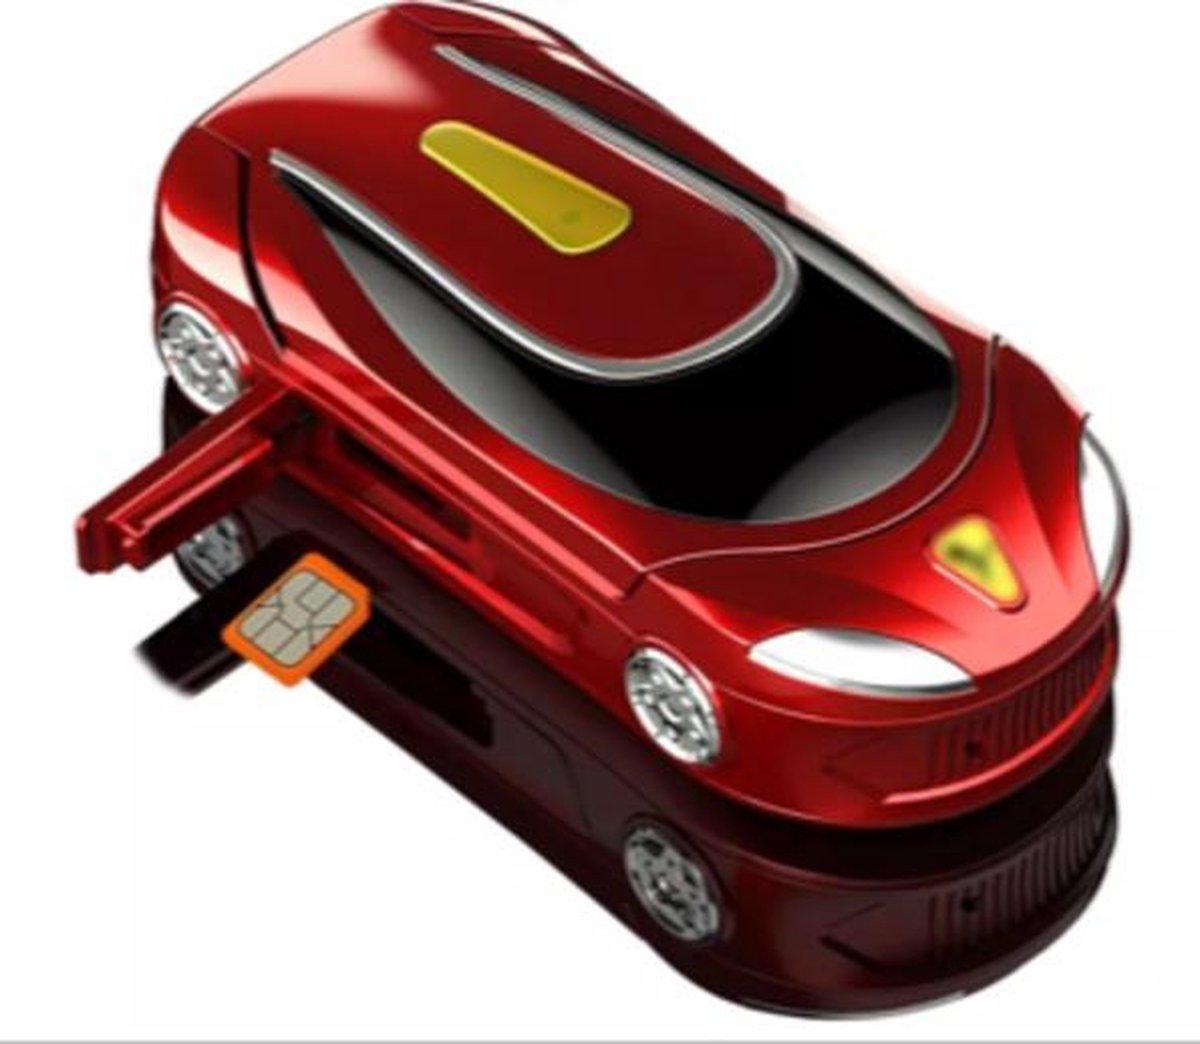 Mini Gsm – Mini Telefoon -mini Auto  Gsm – Kleine Telefoon – Auto Mini Gsm – Met Bluthooth